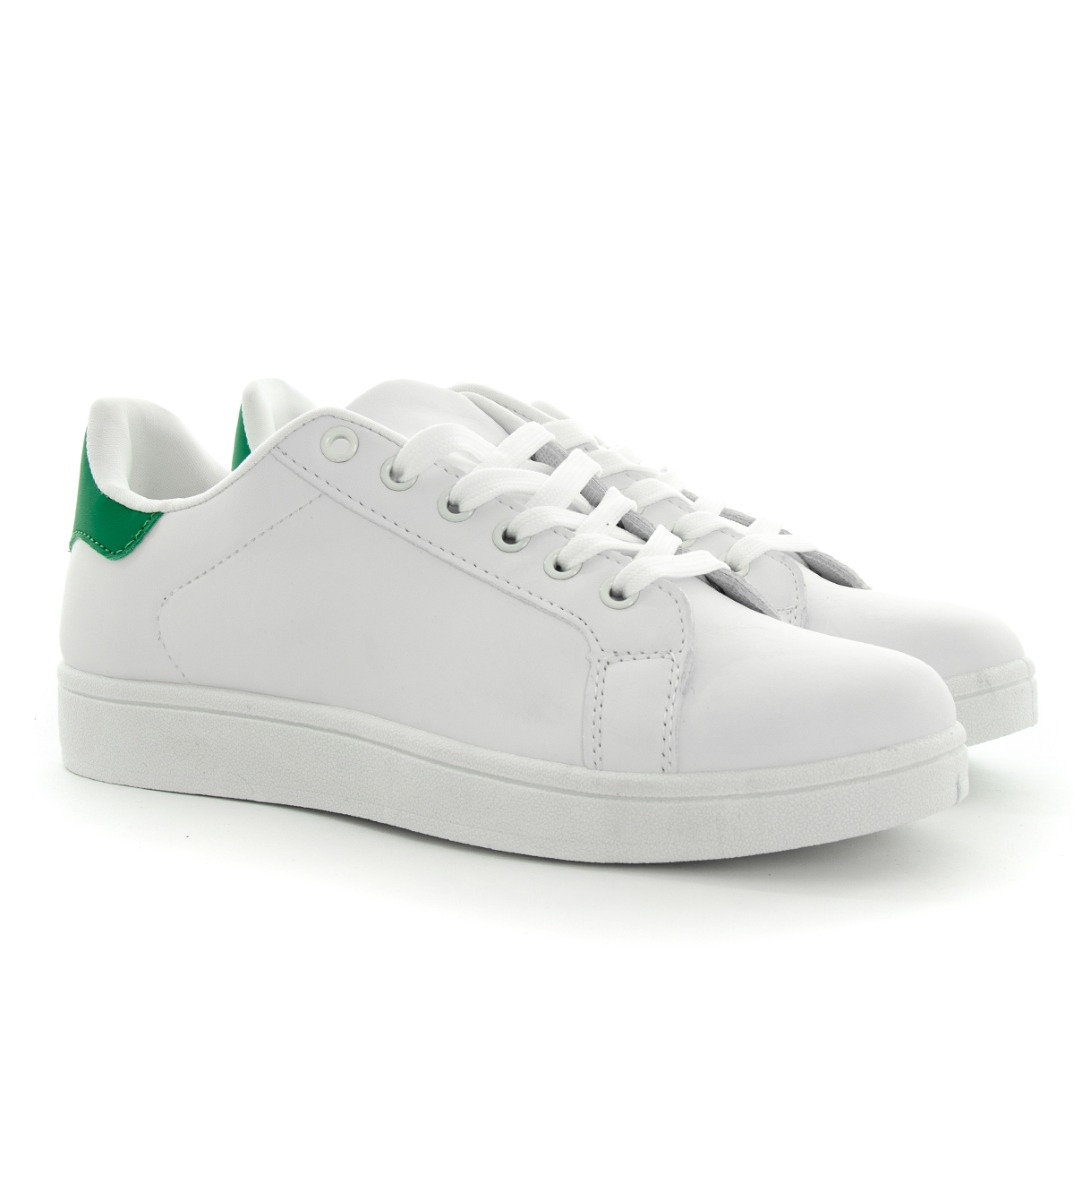 Details about Scarpe Uomo Sneakers Sportive Basse Tinta Unita Bianche Verde Shoes Calzature